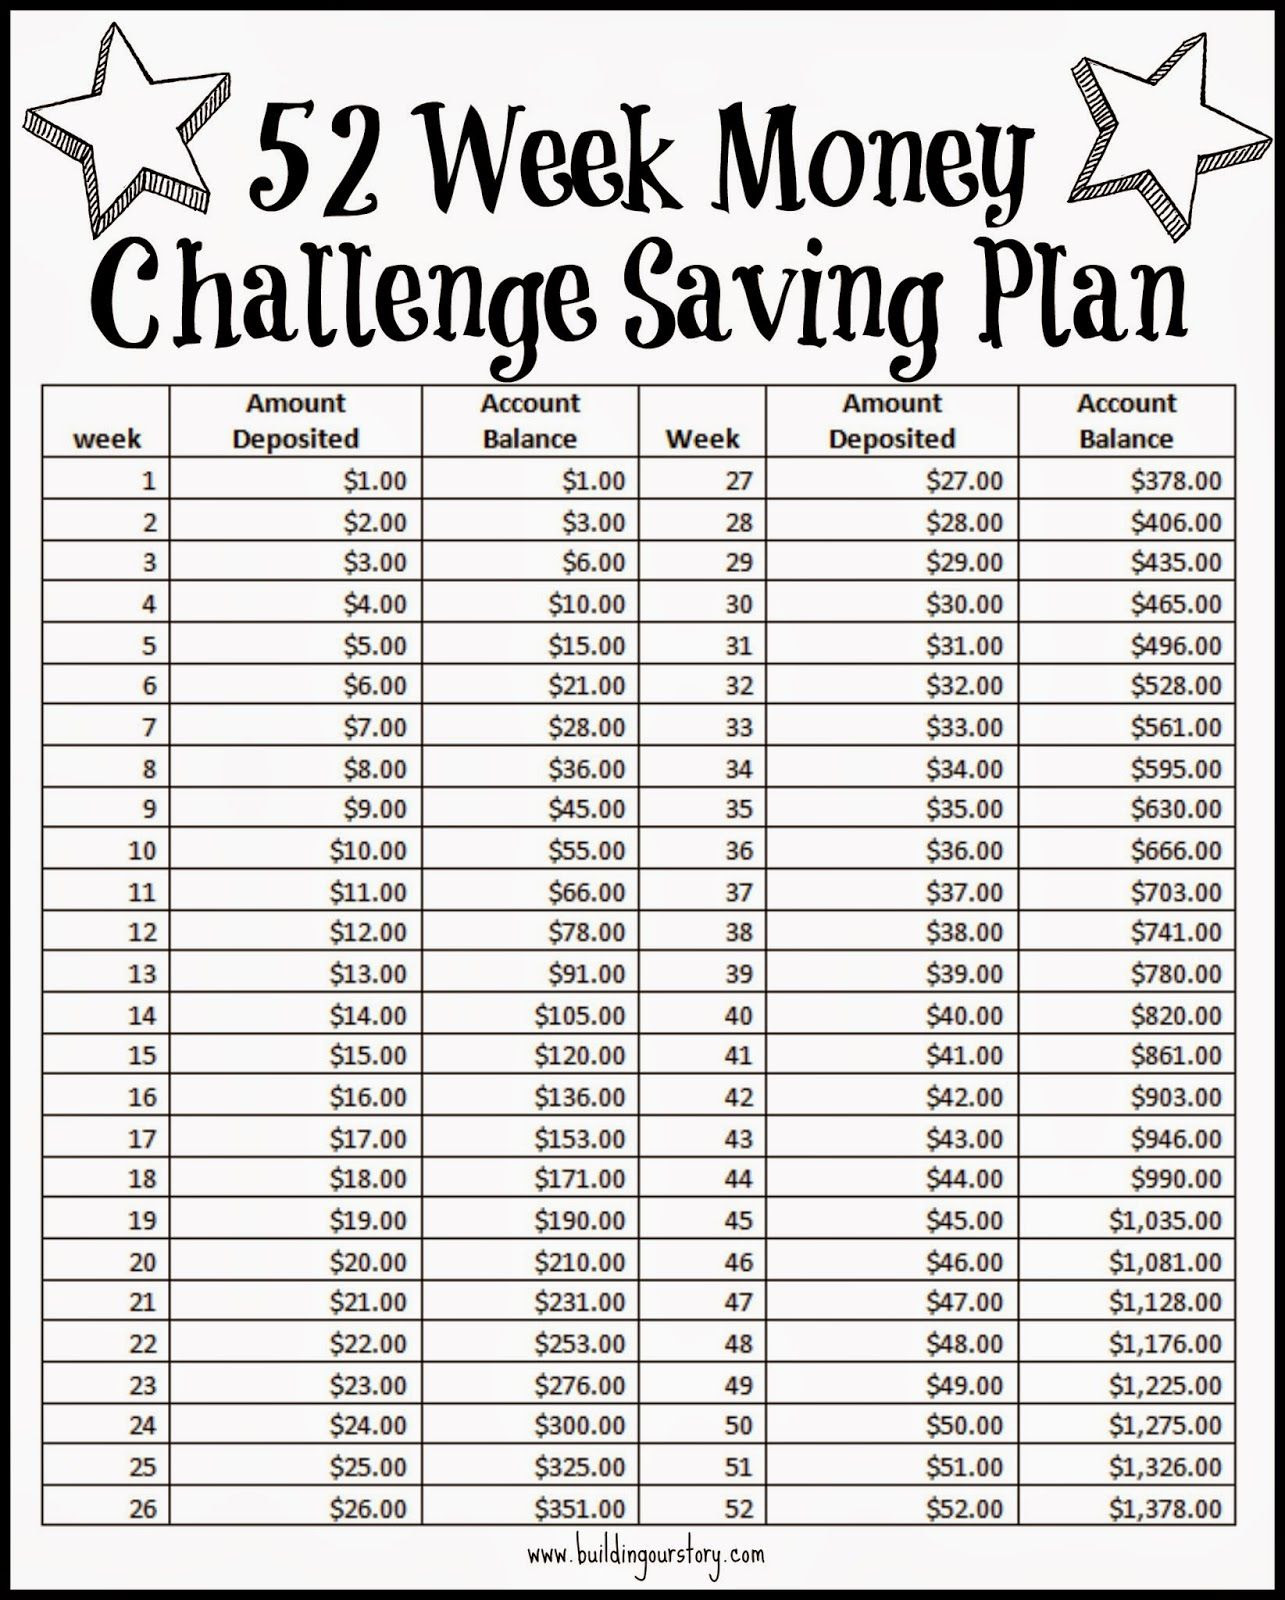 1000+ ideas about 52 Week Money Challenge on Pinterest | Savings ...